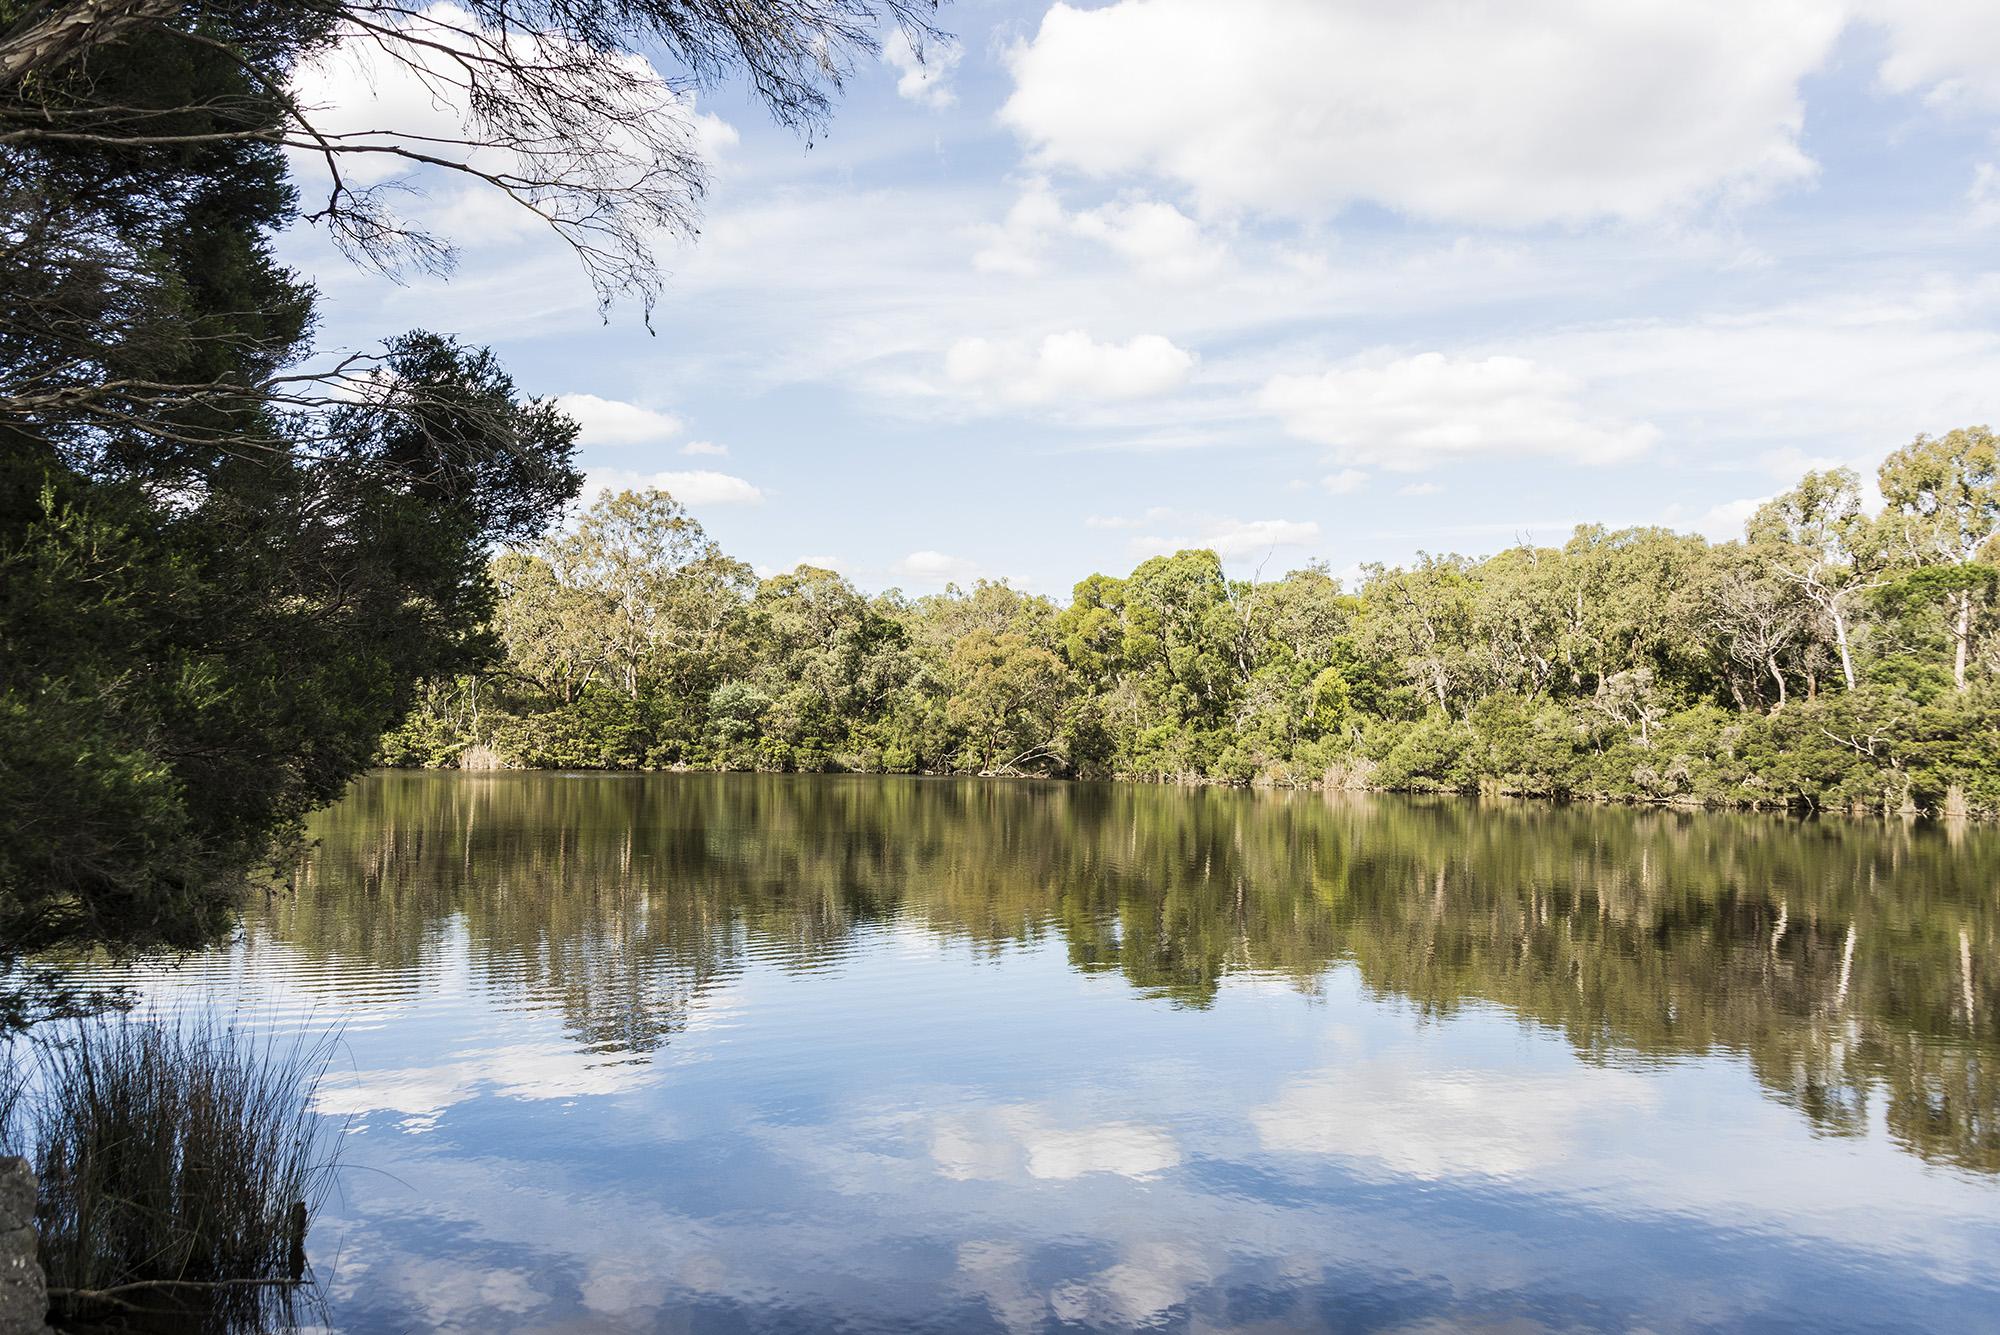 Blackburn Lake Sanctury